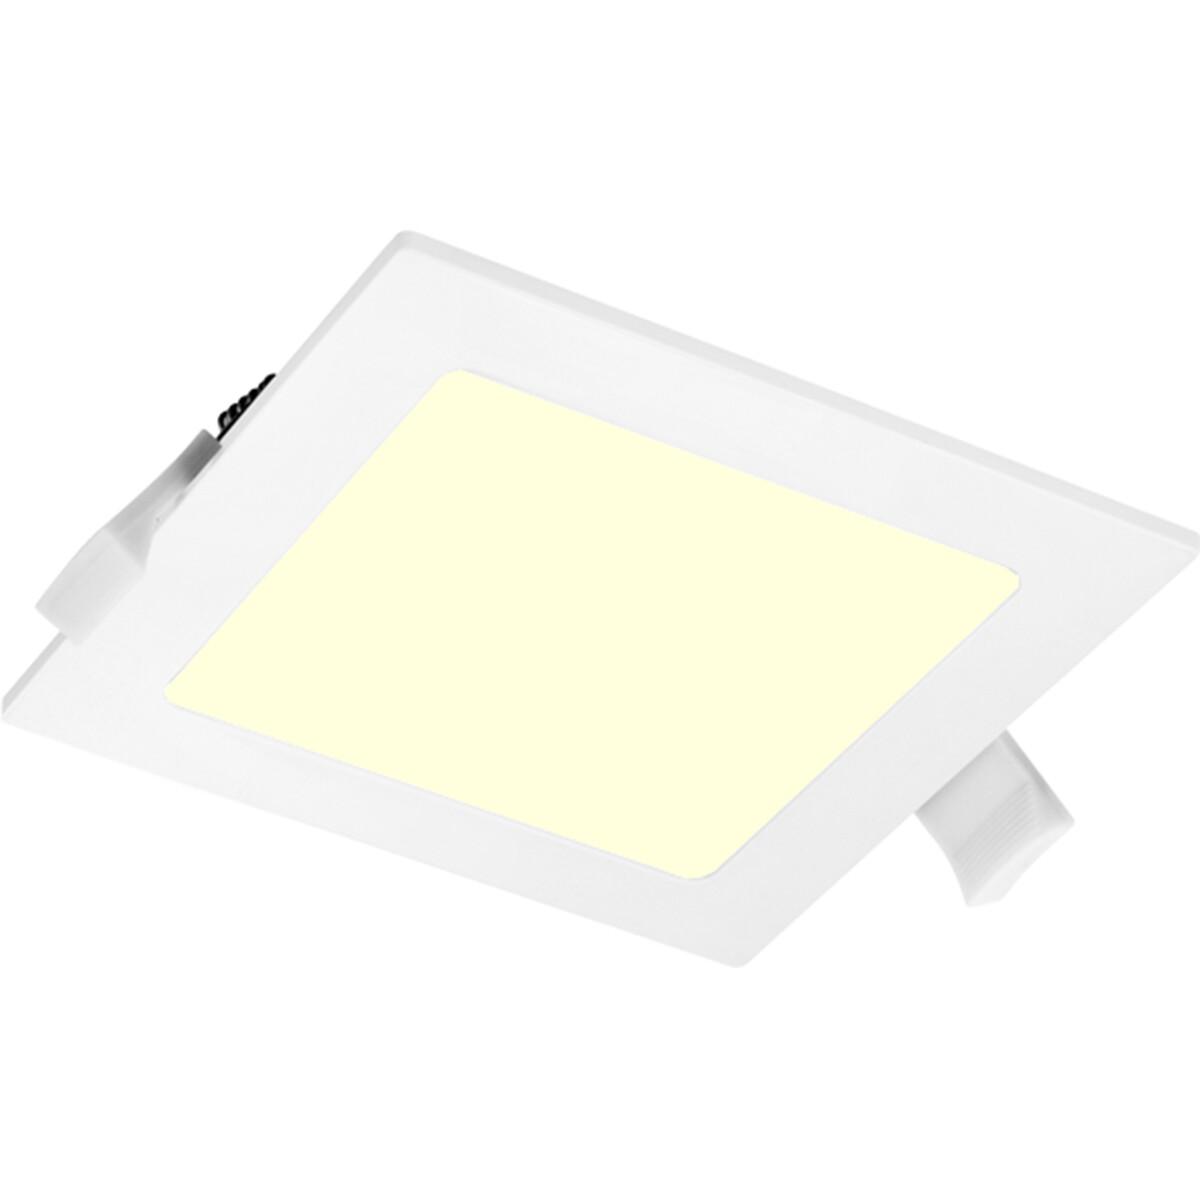 LED Downlight Slim Pro - Aigi Suno - Inbouw Vierkant 18W - Warm Wit 3000K - Mat Wit - Kunststof